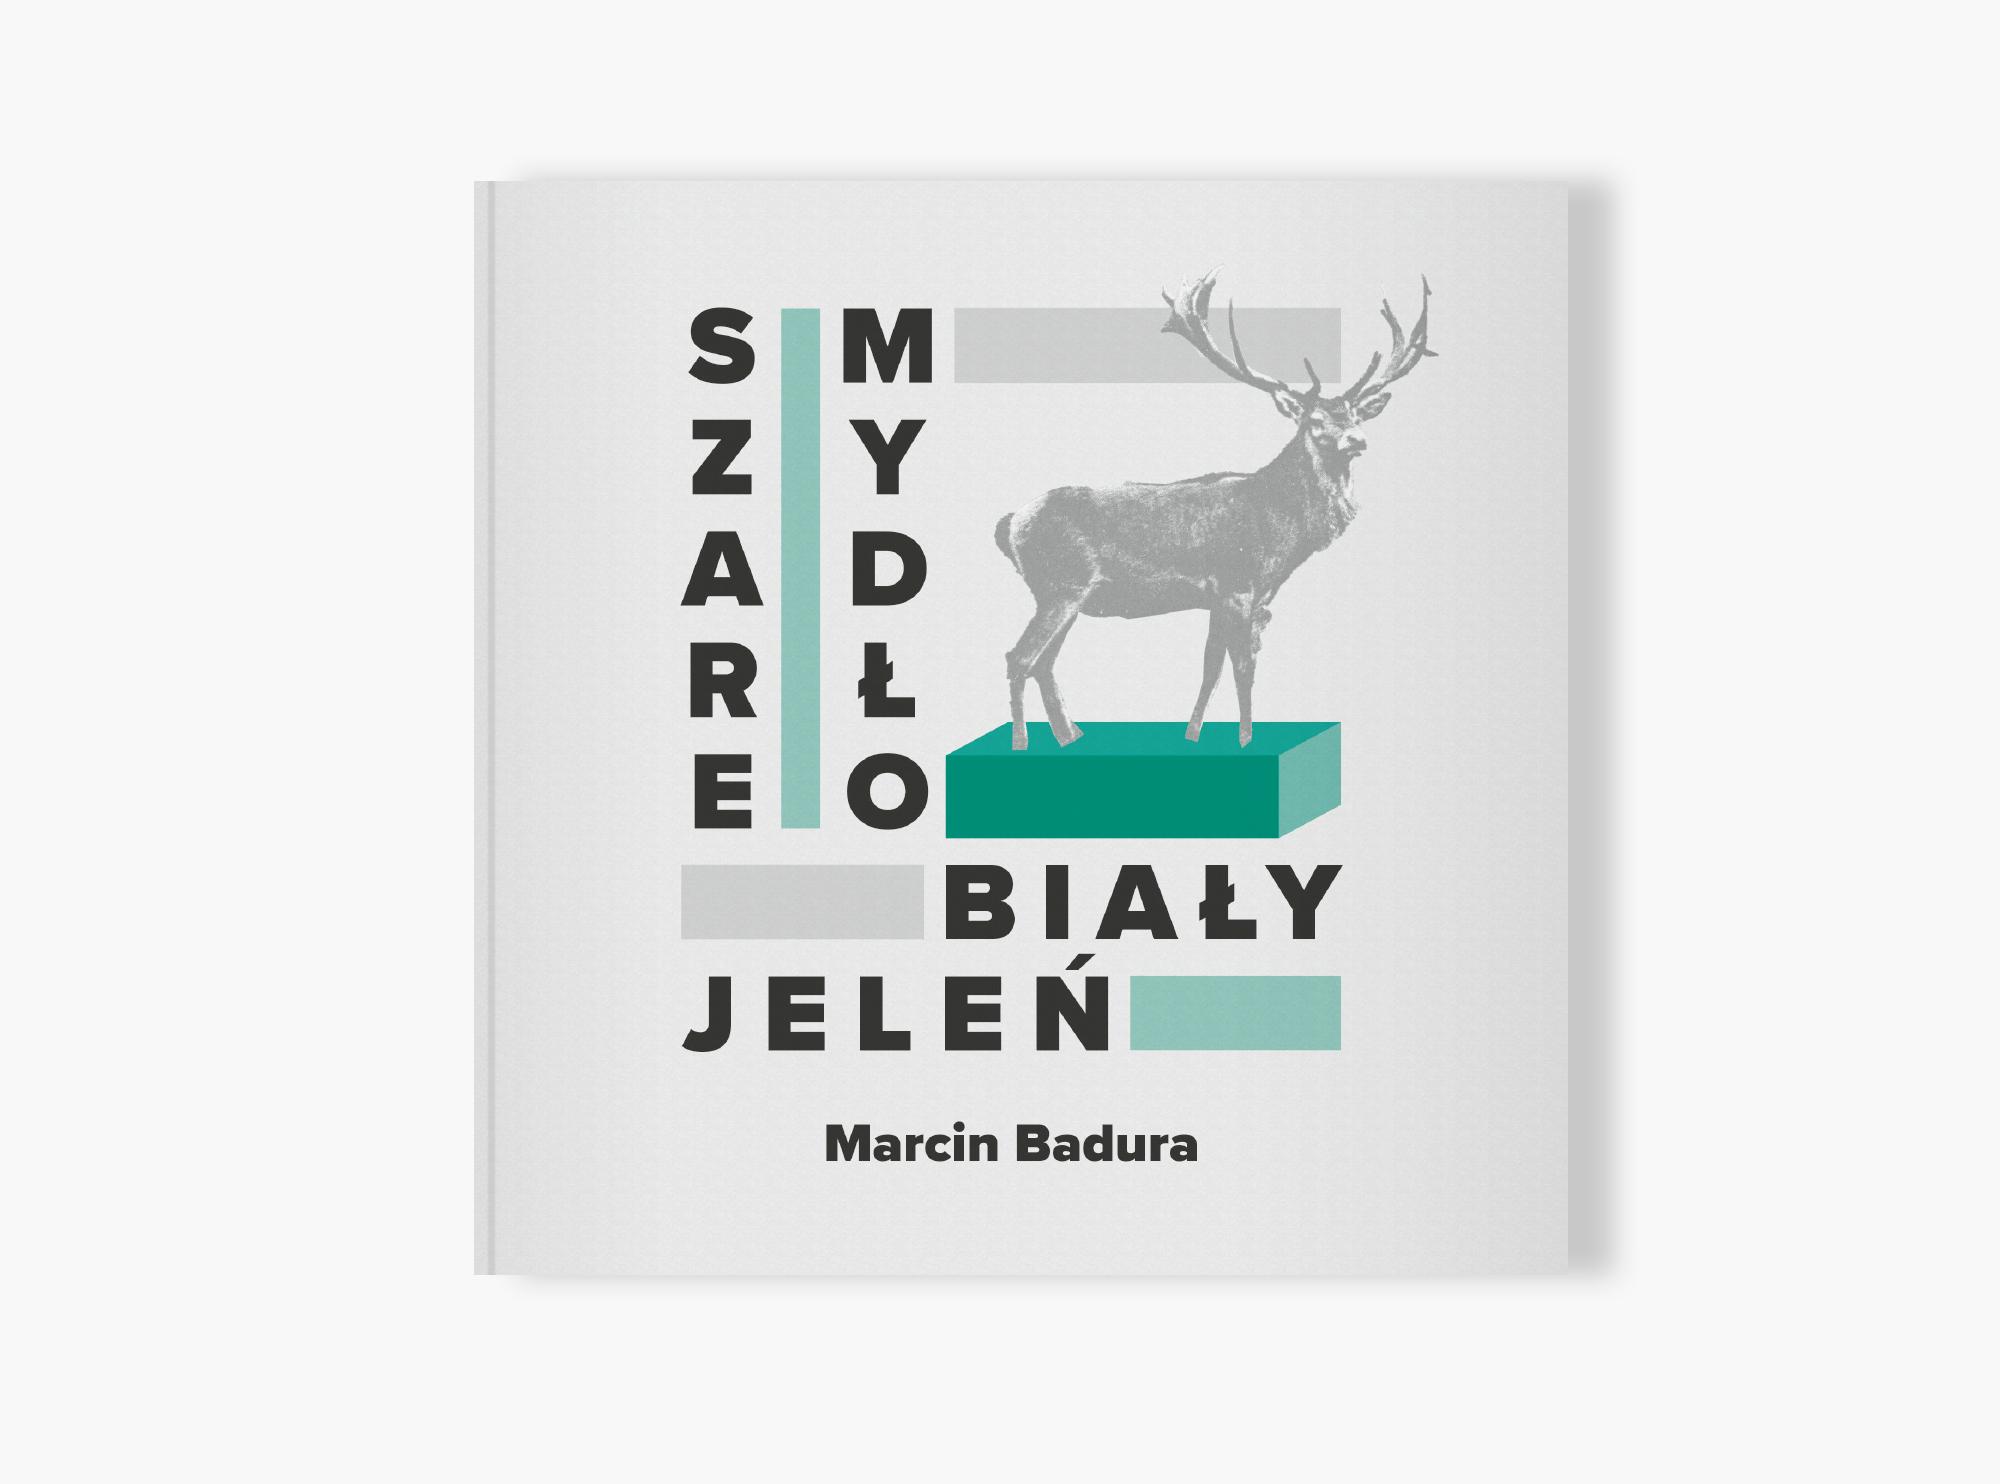 Szare mydło biały jeleń Marcin Badura